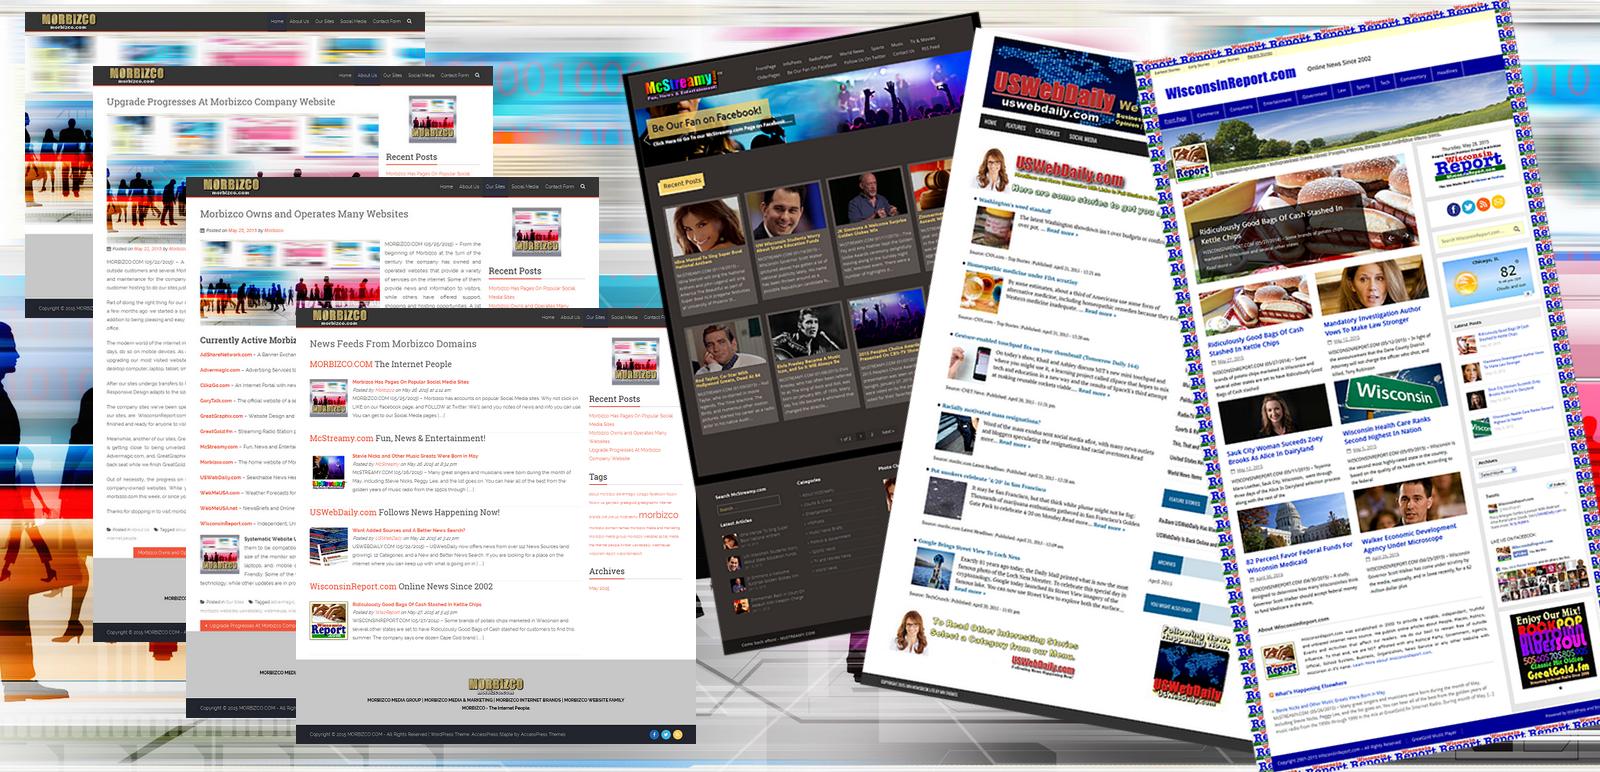 4 Morbizco Internet Media Sites Offer News and Info